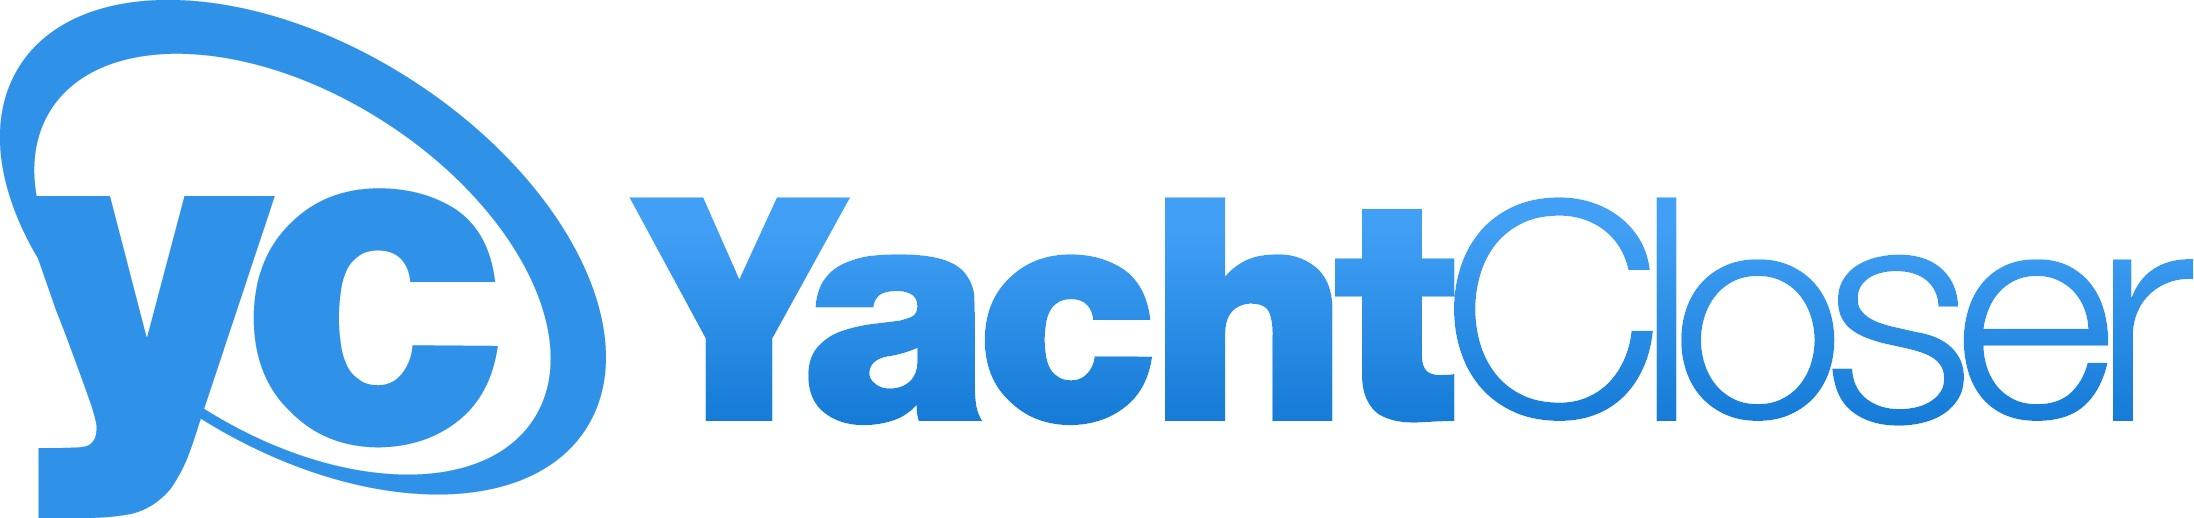 YachtCloser-LOGO-HI_RES_large 4